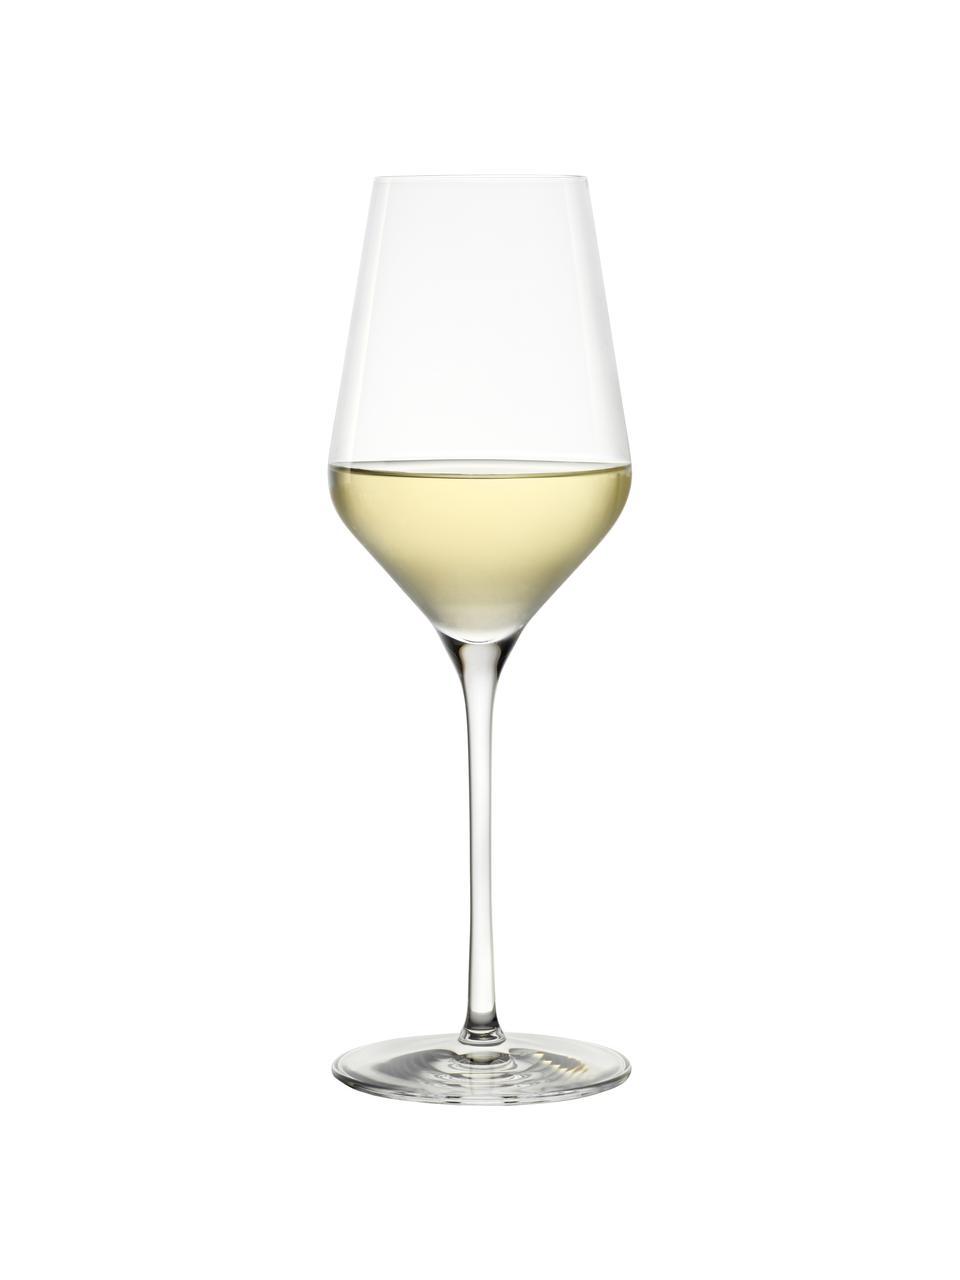 Kristallen witte wijnglazenset Quatrophil, 6-delig, Kristalglas, Transparant, Ø 8 x H 25 cm